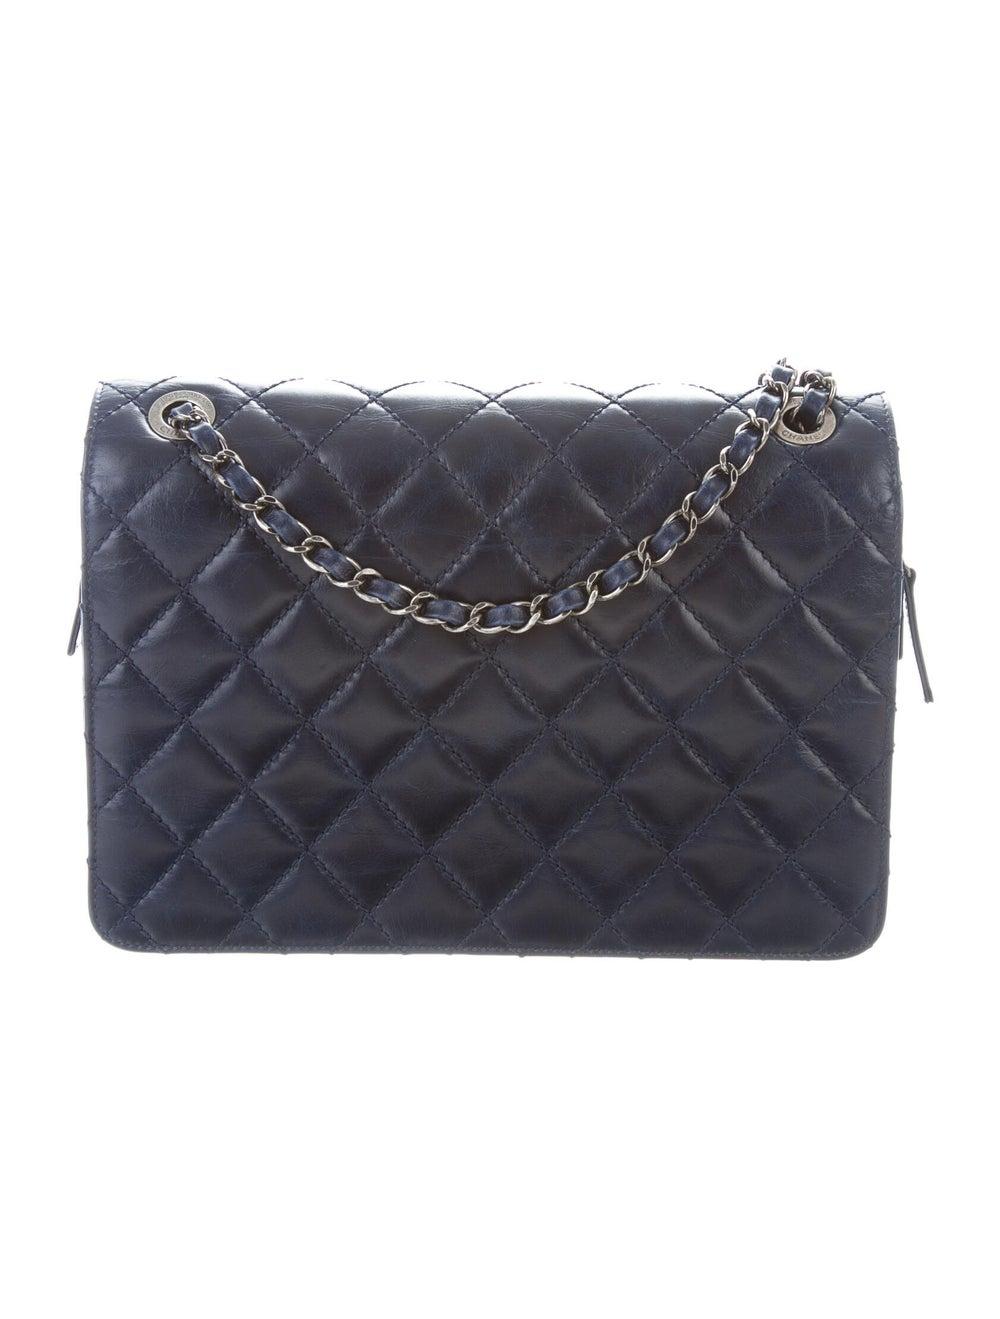 Chanel Day Trip Flap Bag Blue - image 4